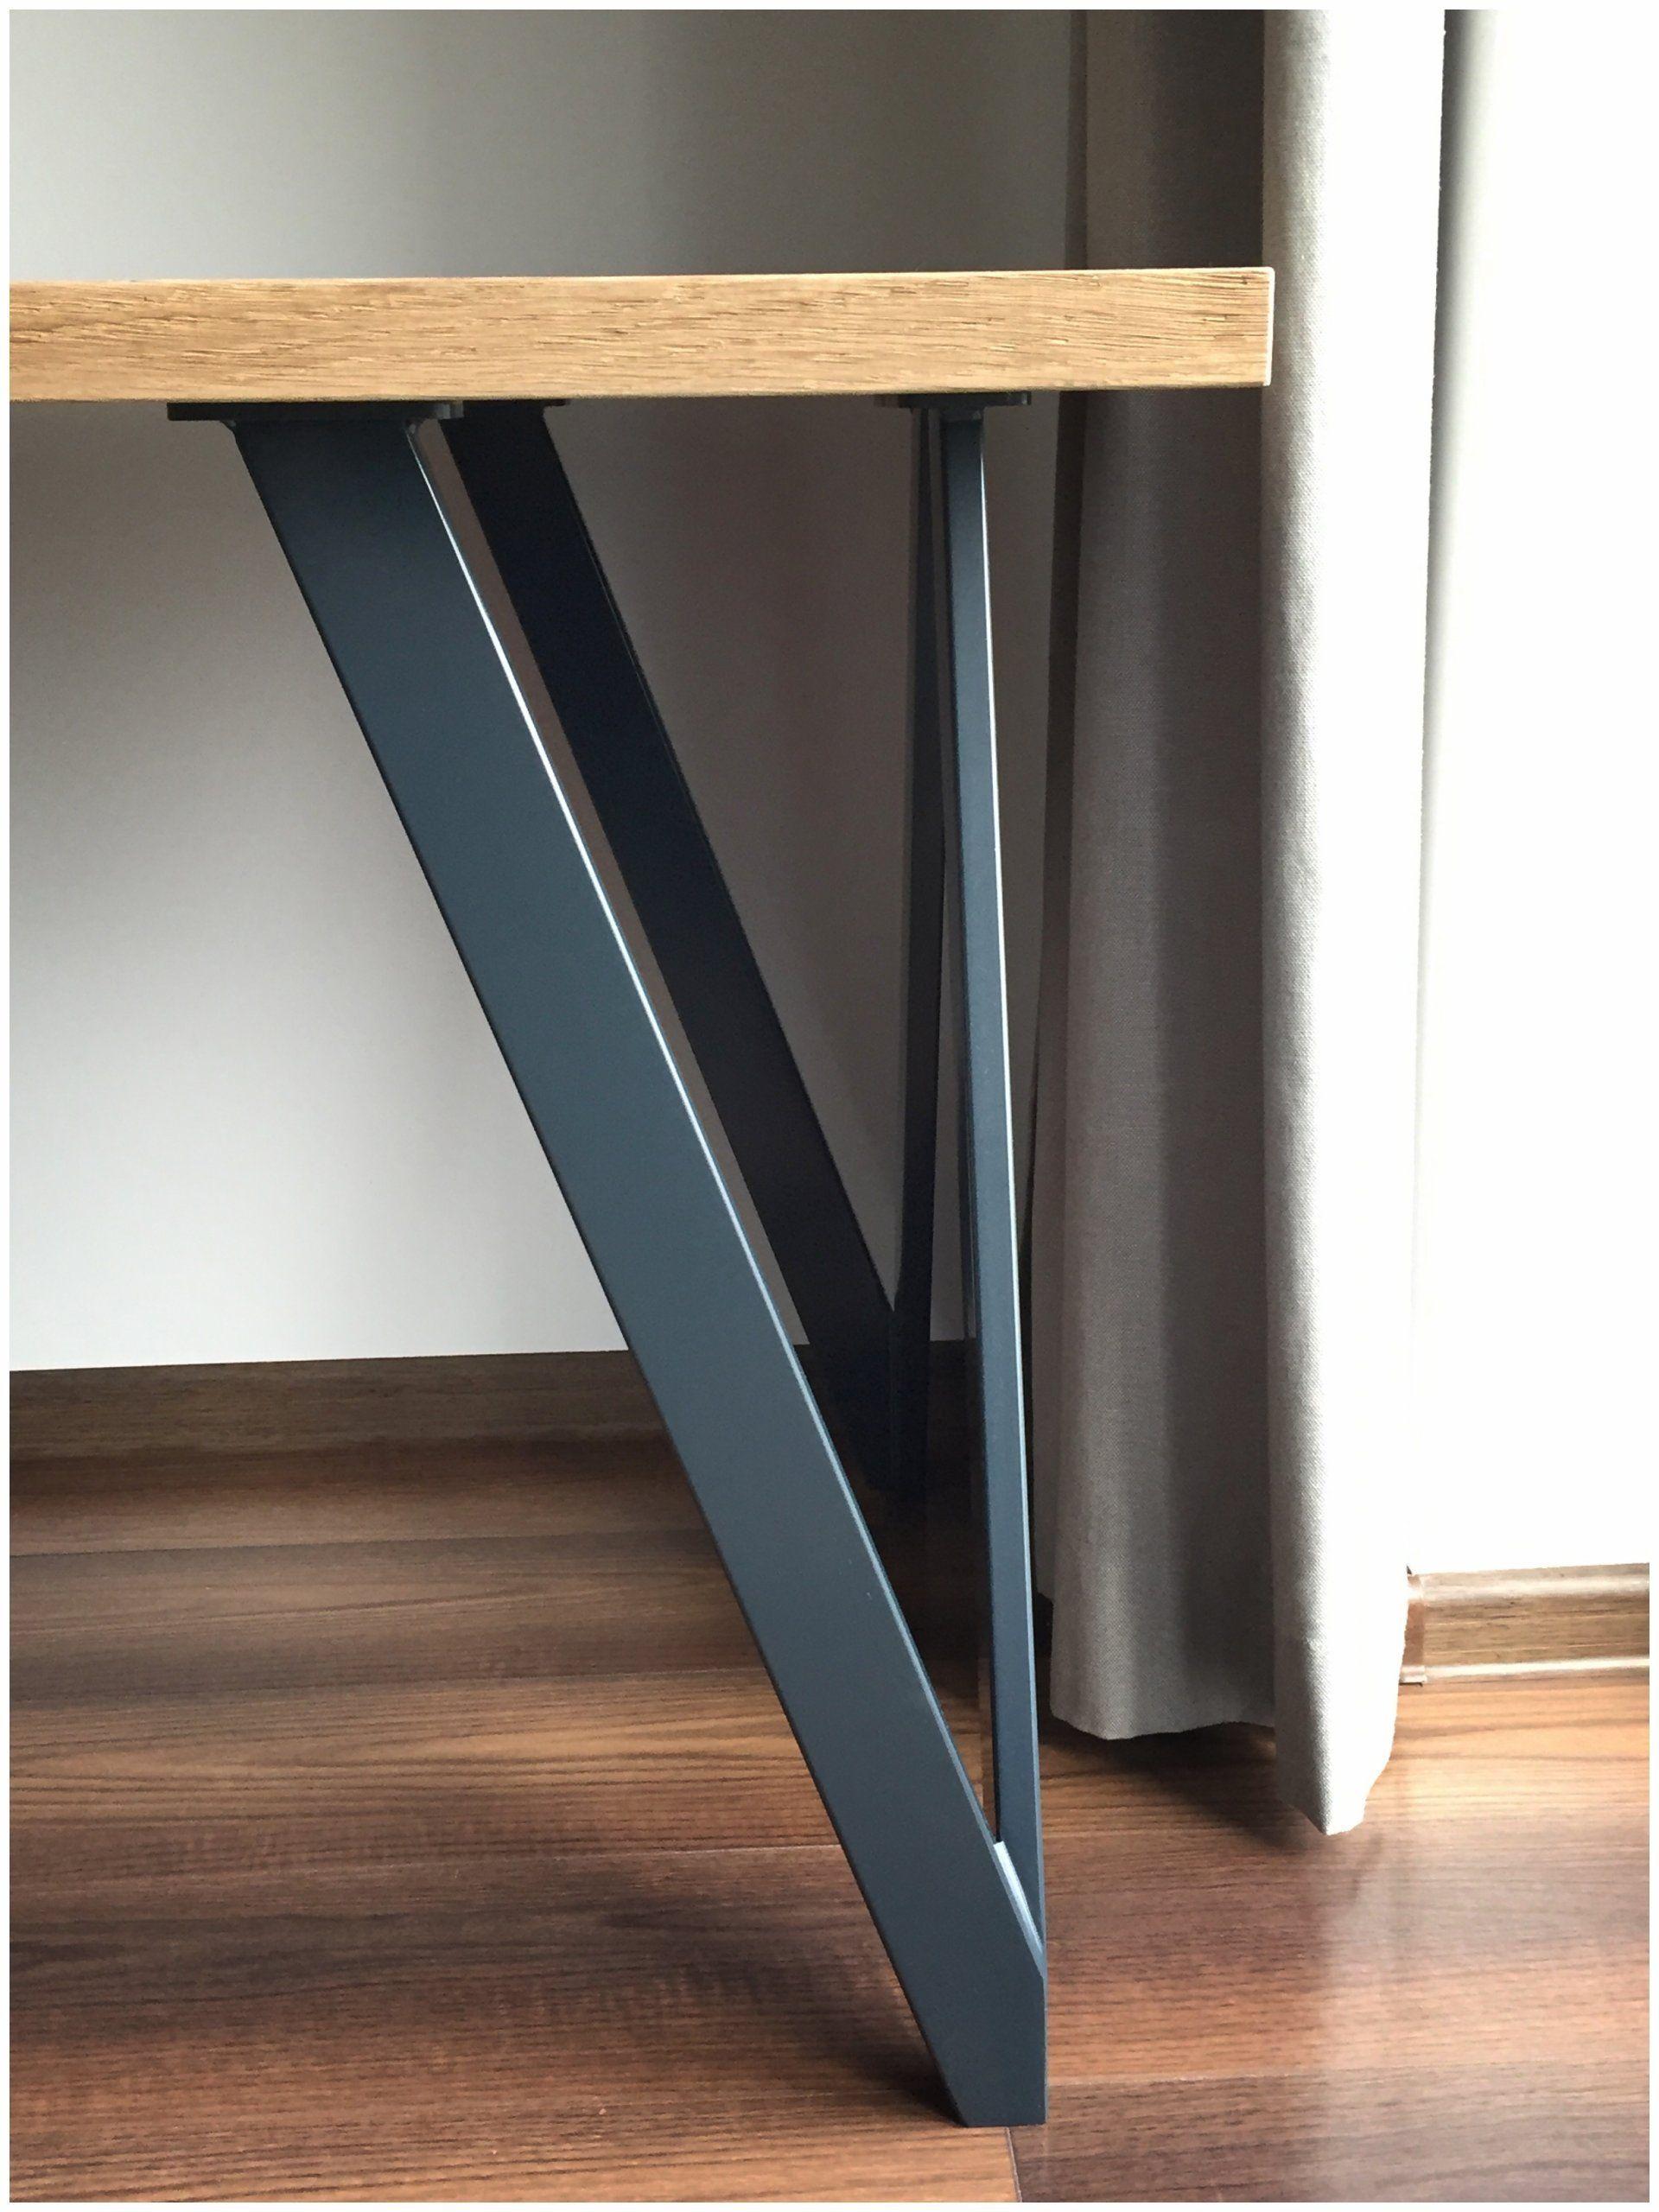 Table Legs Modern Steel Legs Interiors Set Of 4 Diy Etsy Moveis De Caixotes Moveis Estilo Industrial Movel Sala De Jantar [ 2560 x 1920 Pixel ]